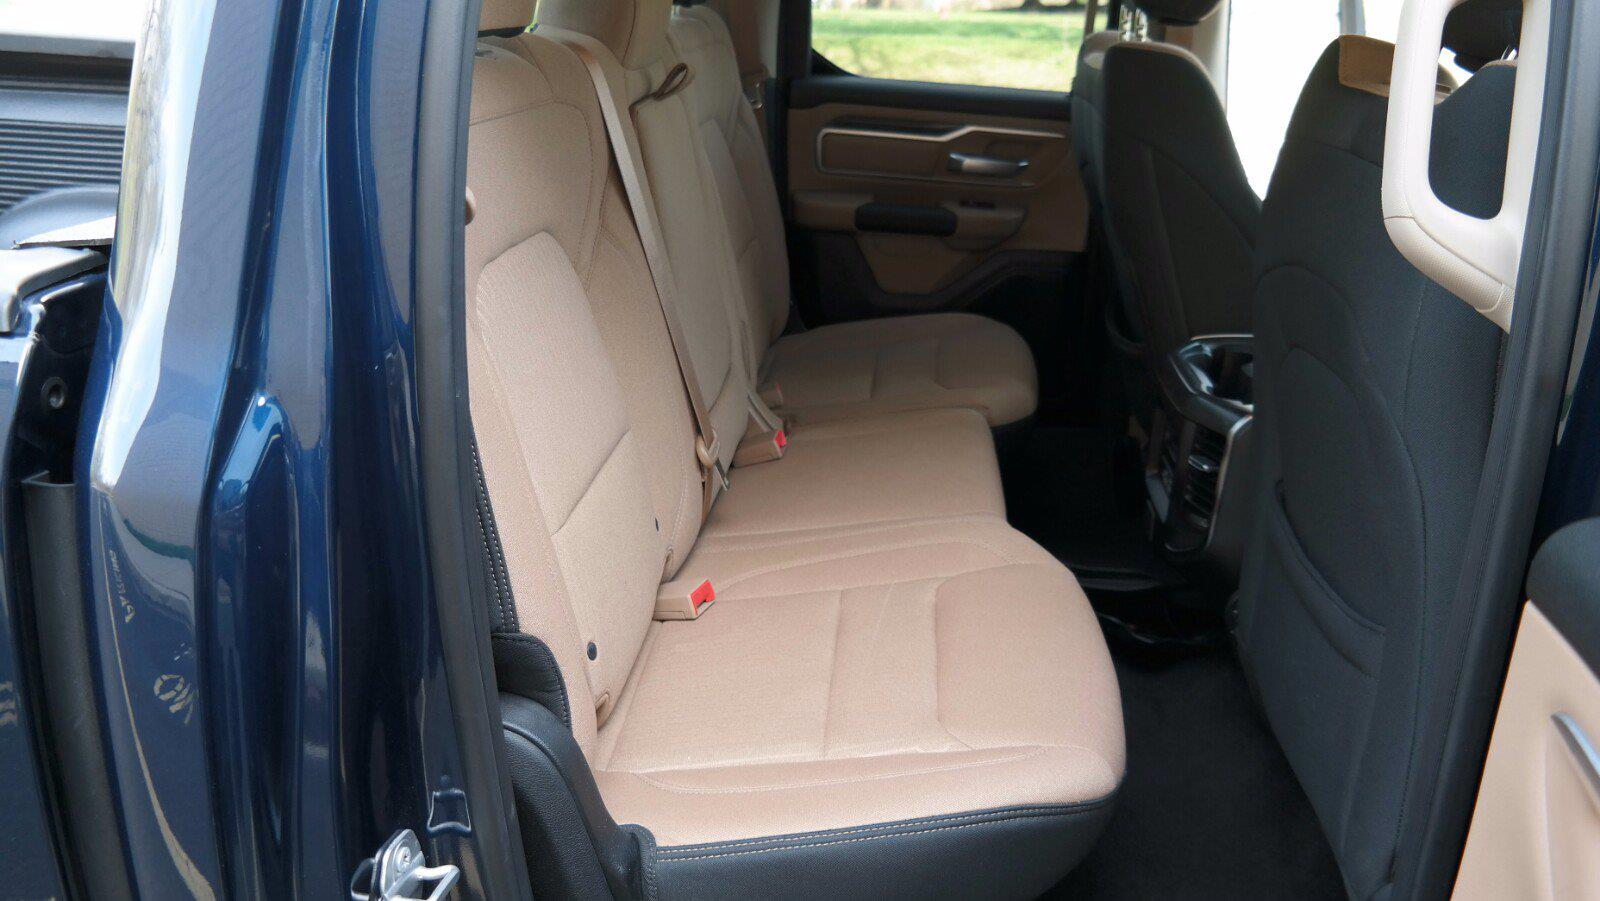 2019 Ram 1500 Quad Cab 4x4, Pickup #FL101401 - photo 16